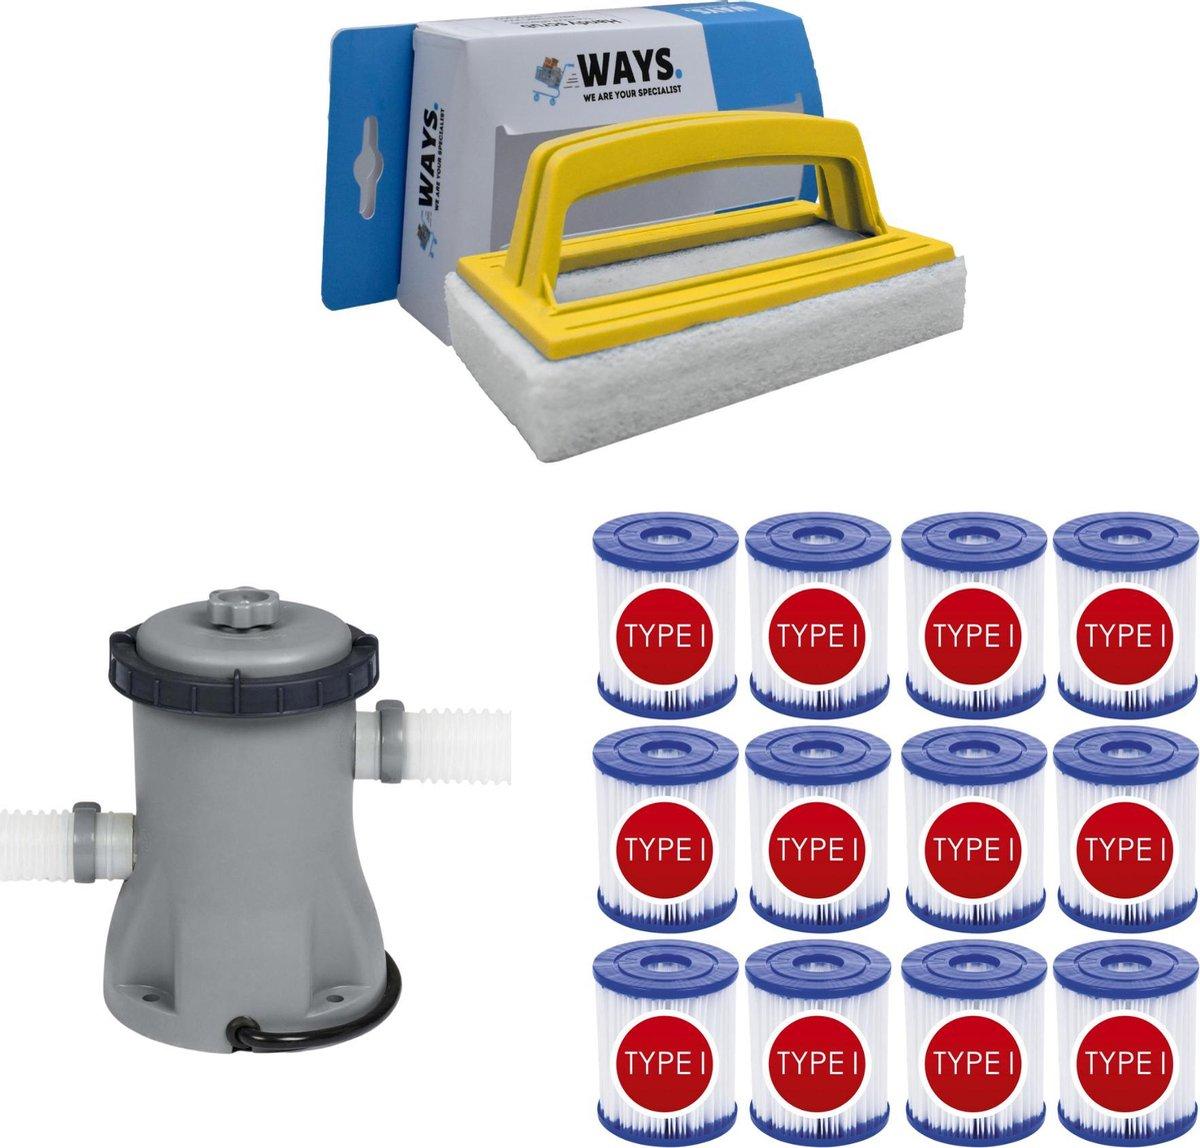 WAYS - Zwembad Onderhoud - Bestway Filterpomp 1249 L/h & 12 Bestway Filters Type I